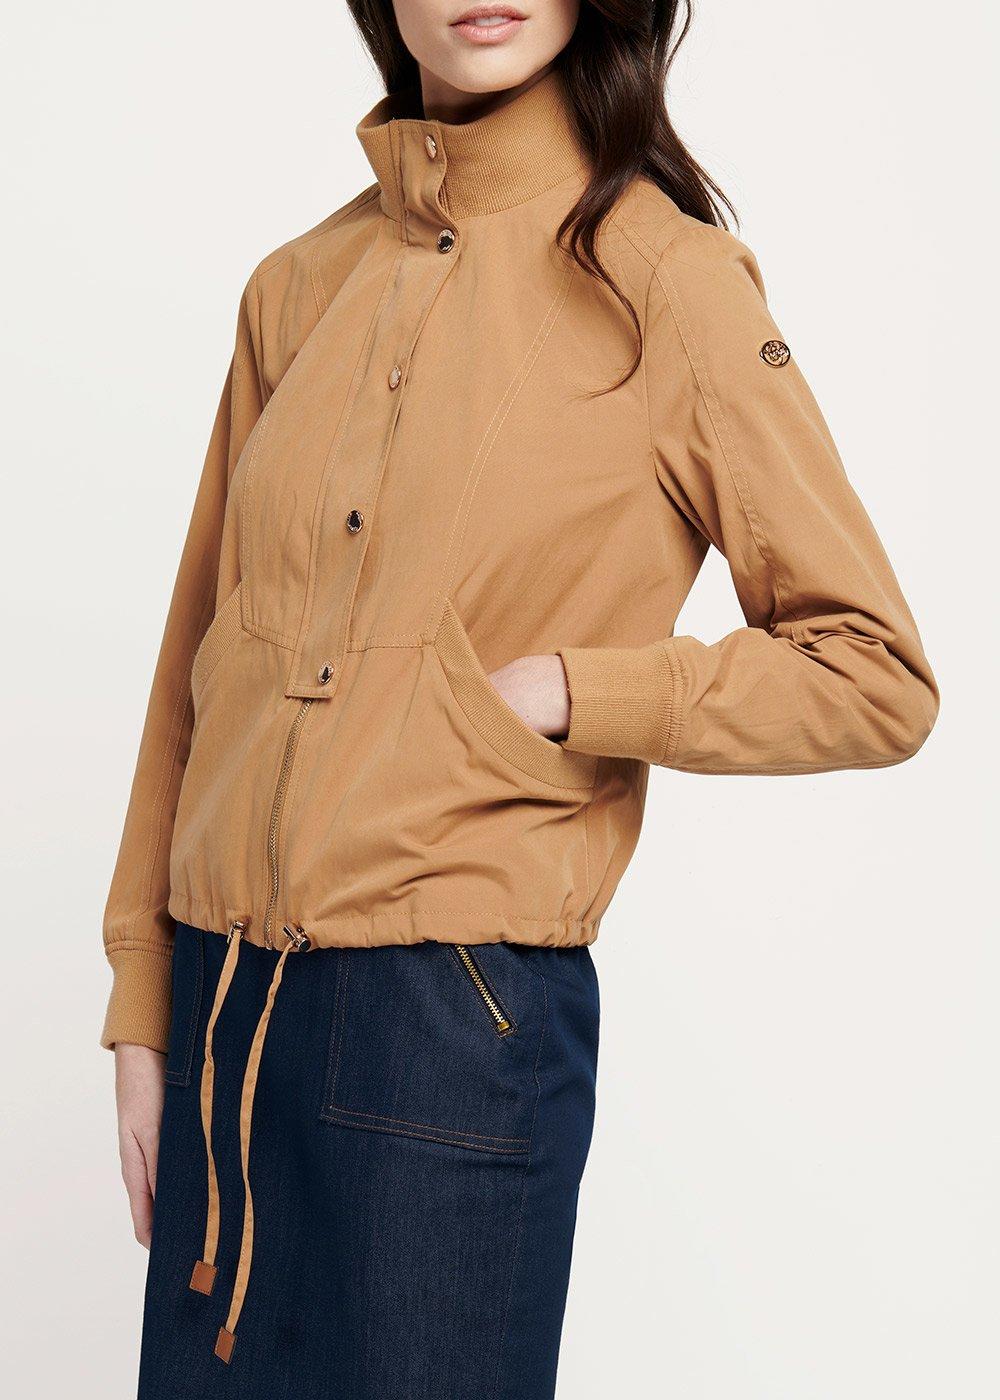 Garret jacket in tobacco-coloured cotton - Tobacco - Woman